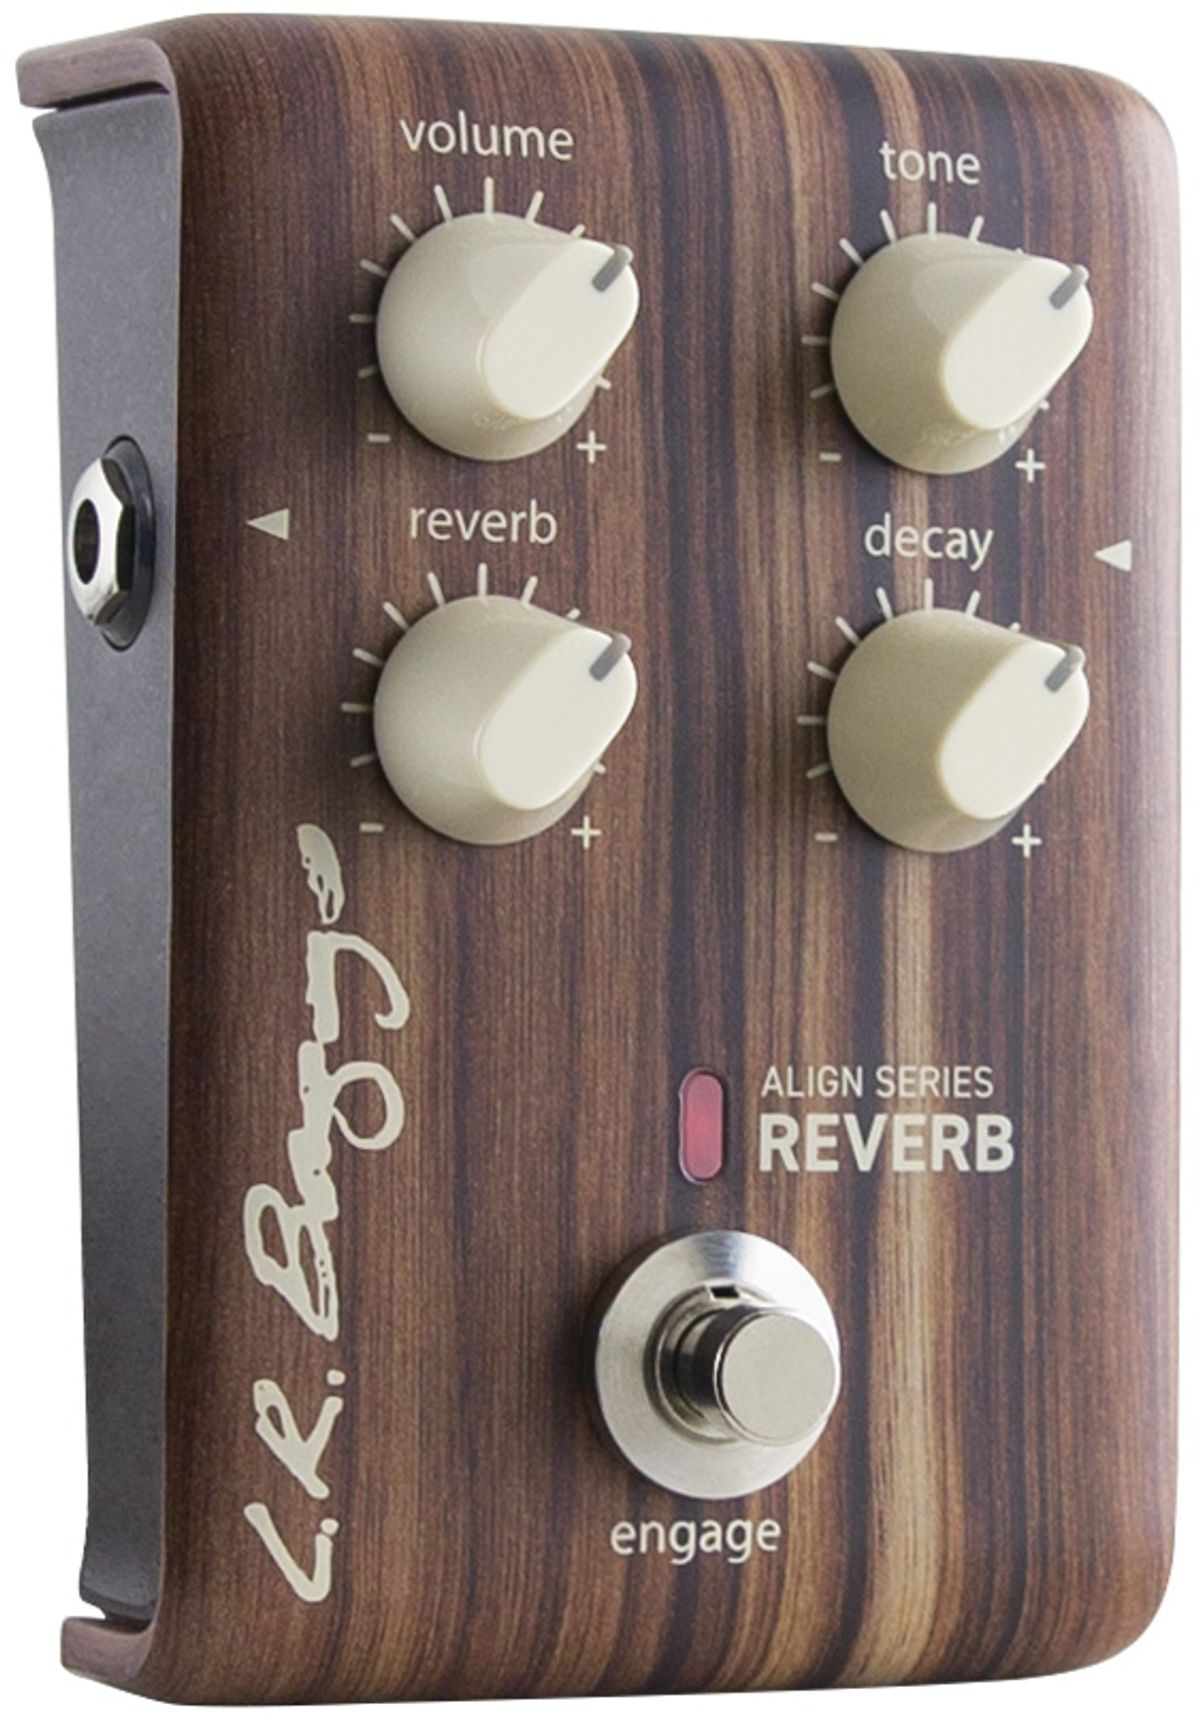 Quick Hit: L.R. Baggs Align Series Reverb Review